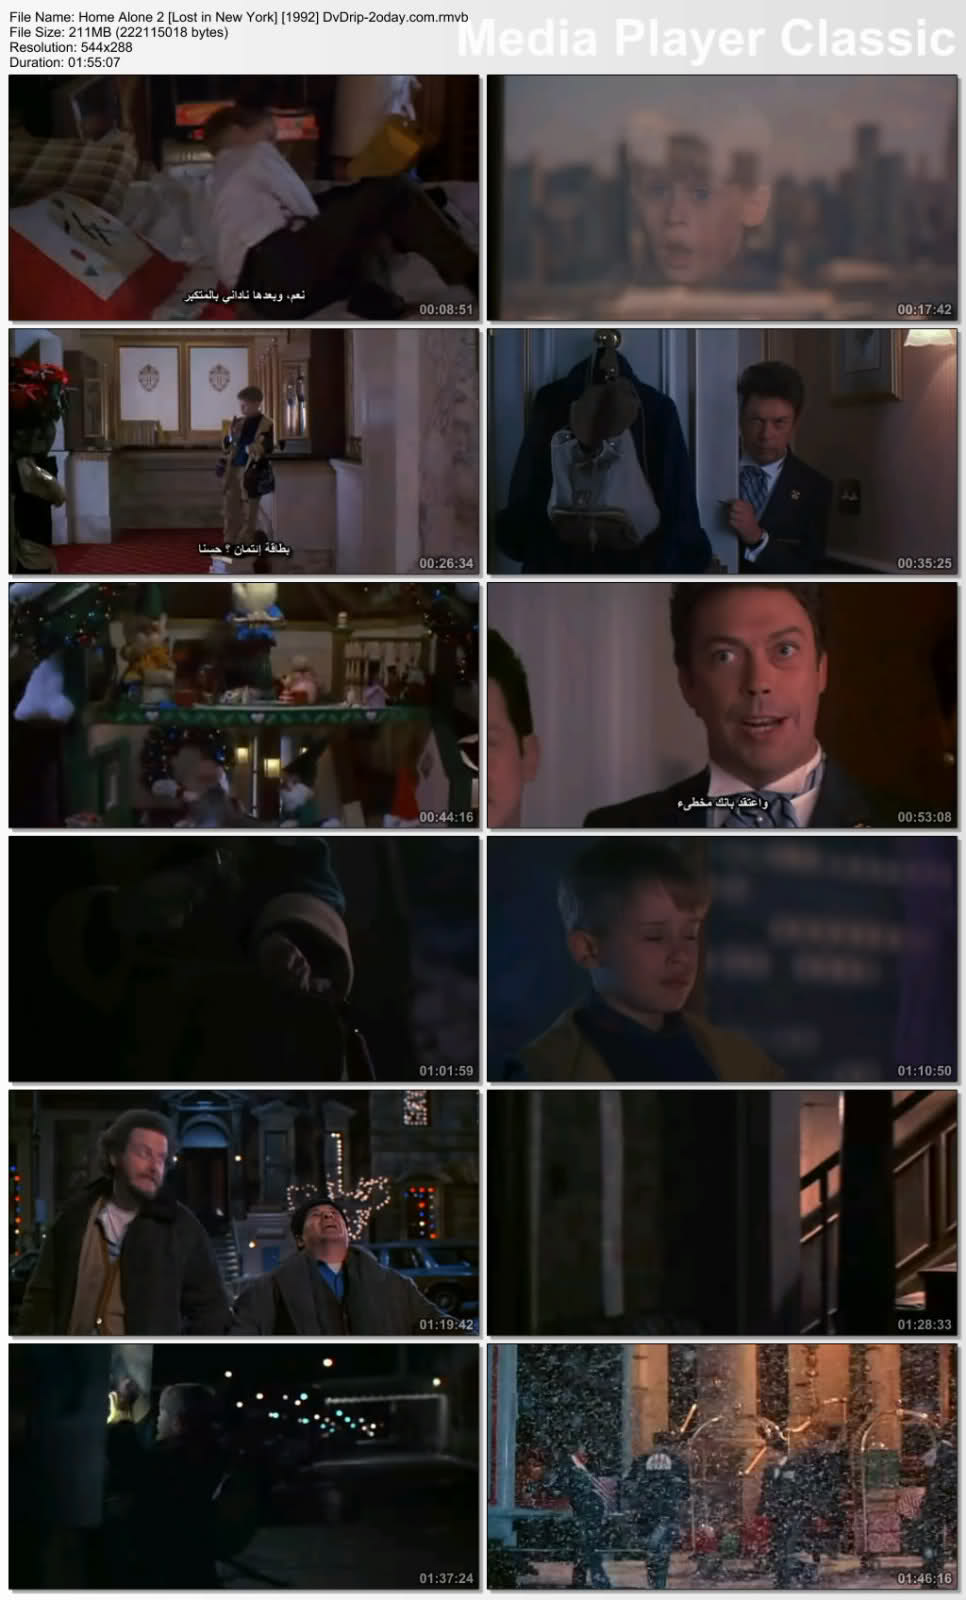 Home Alone quatrain DVDRip سلسلة وحدى فى المنزل كامله ومترجمة Zlrhua